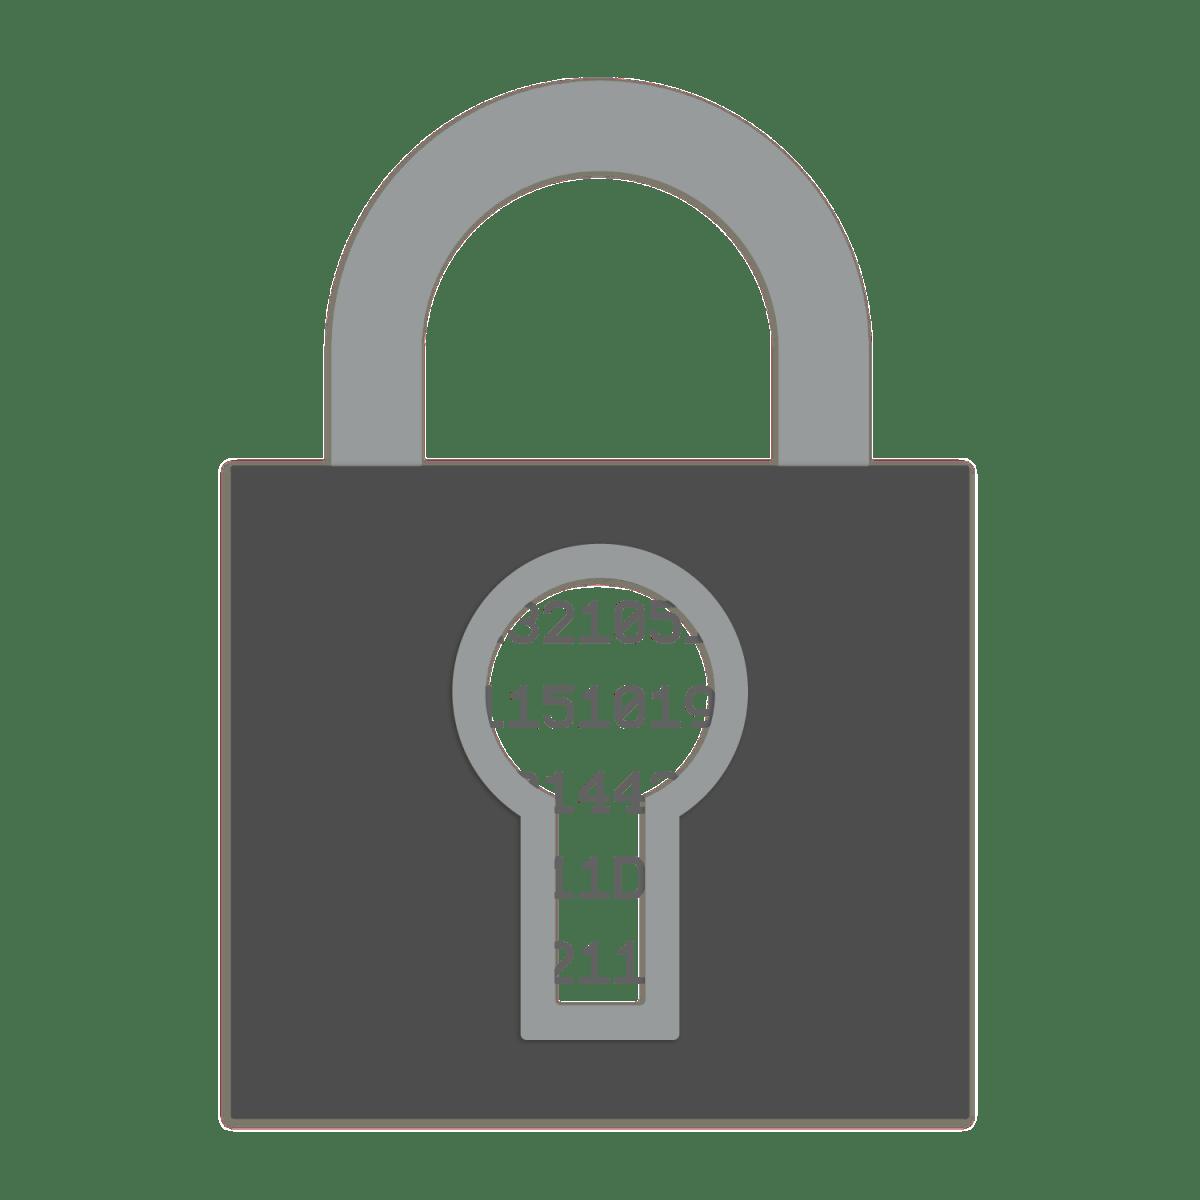 Encrypted lock